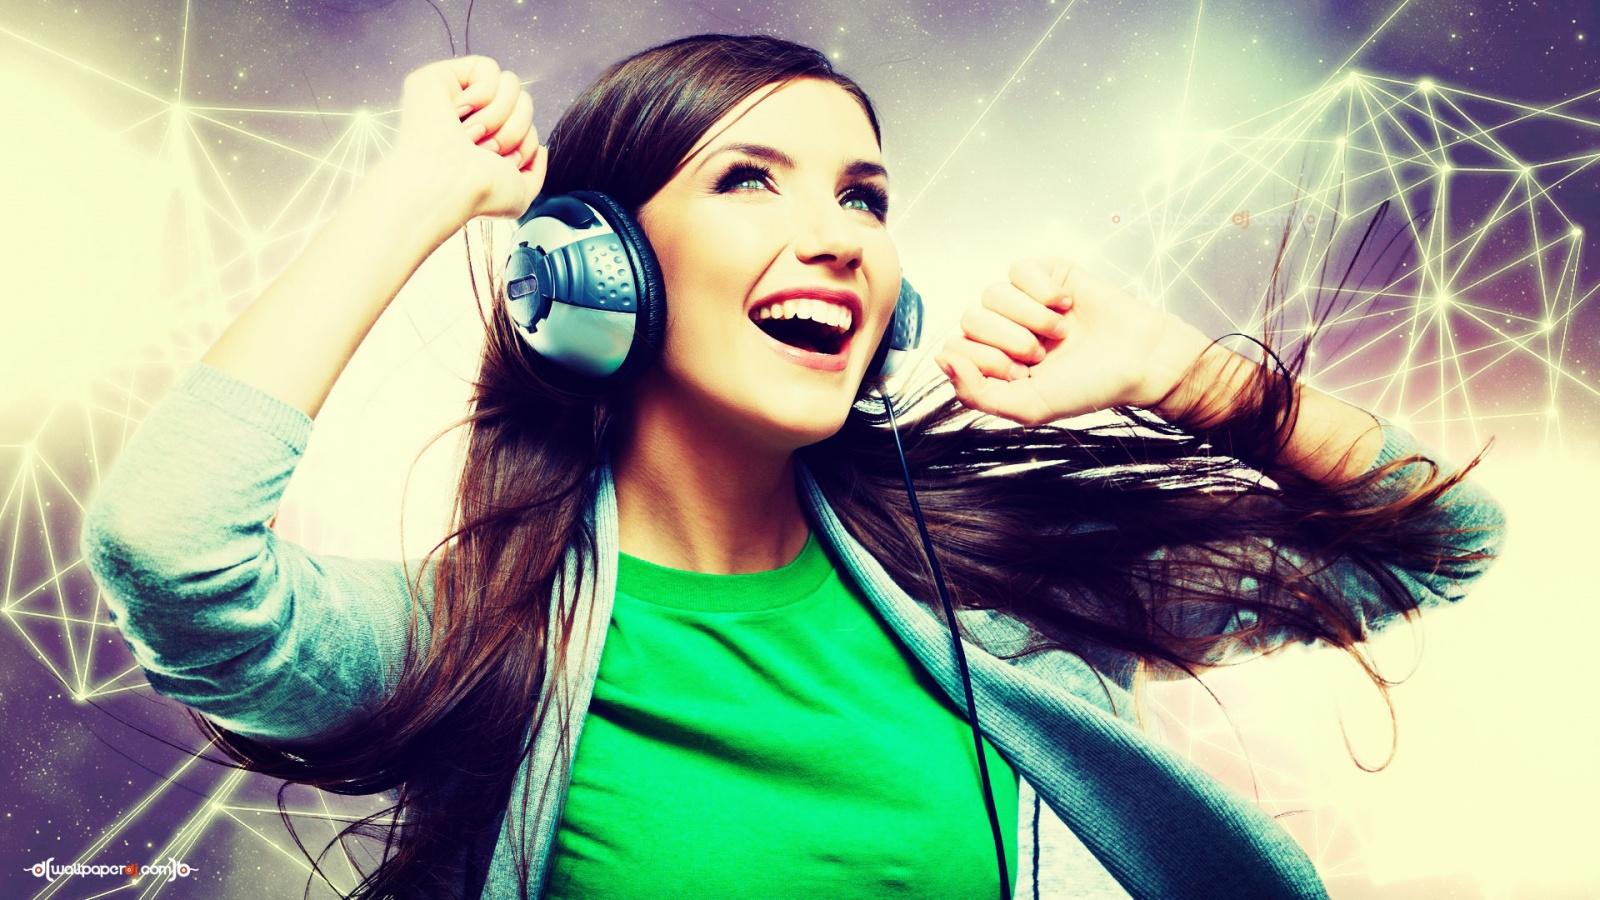 Wonderful Wallpaper Music Hot - music_is_happiness-1600x900  Trends_543897.jpg